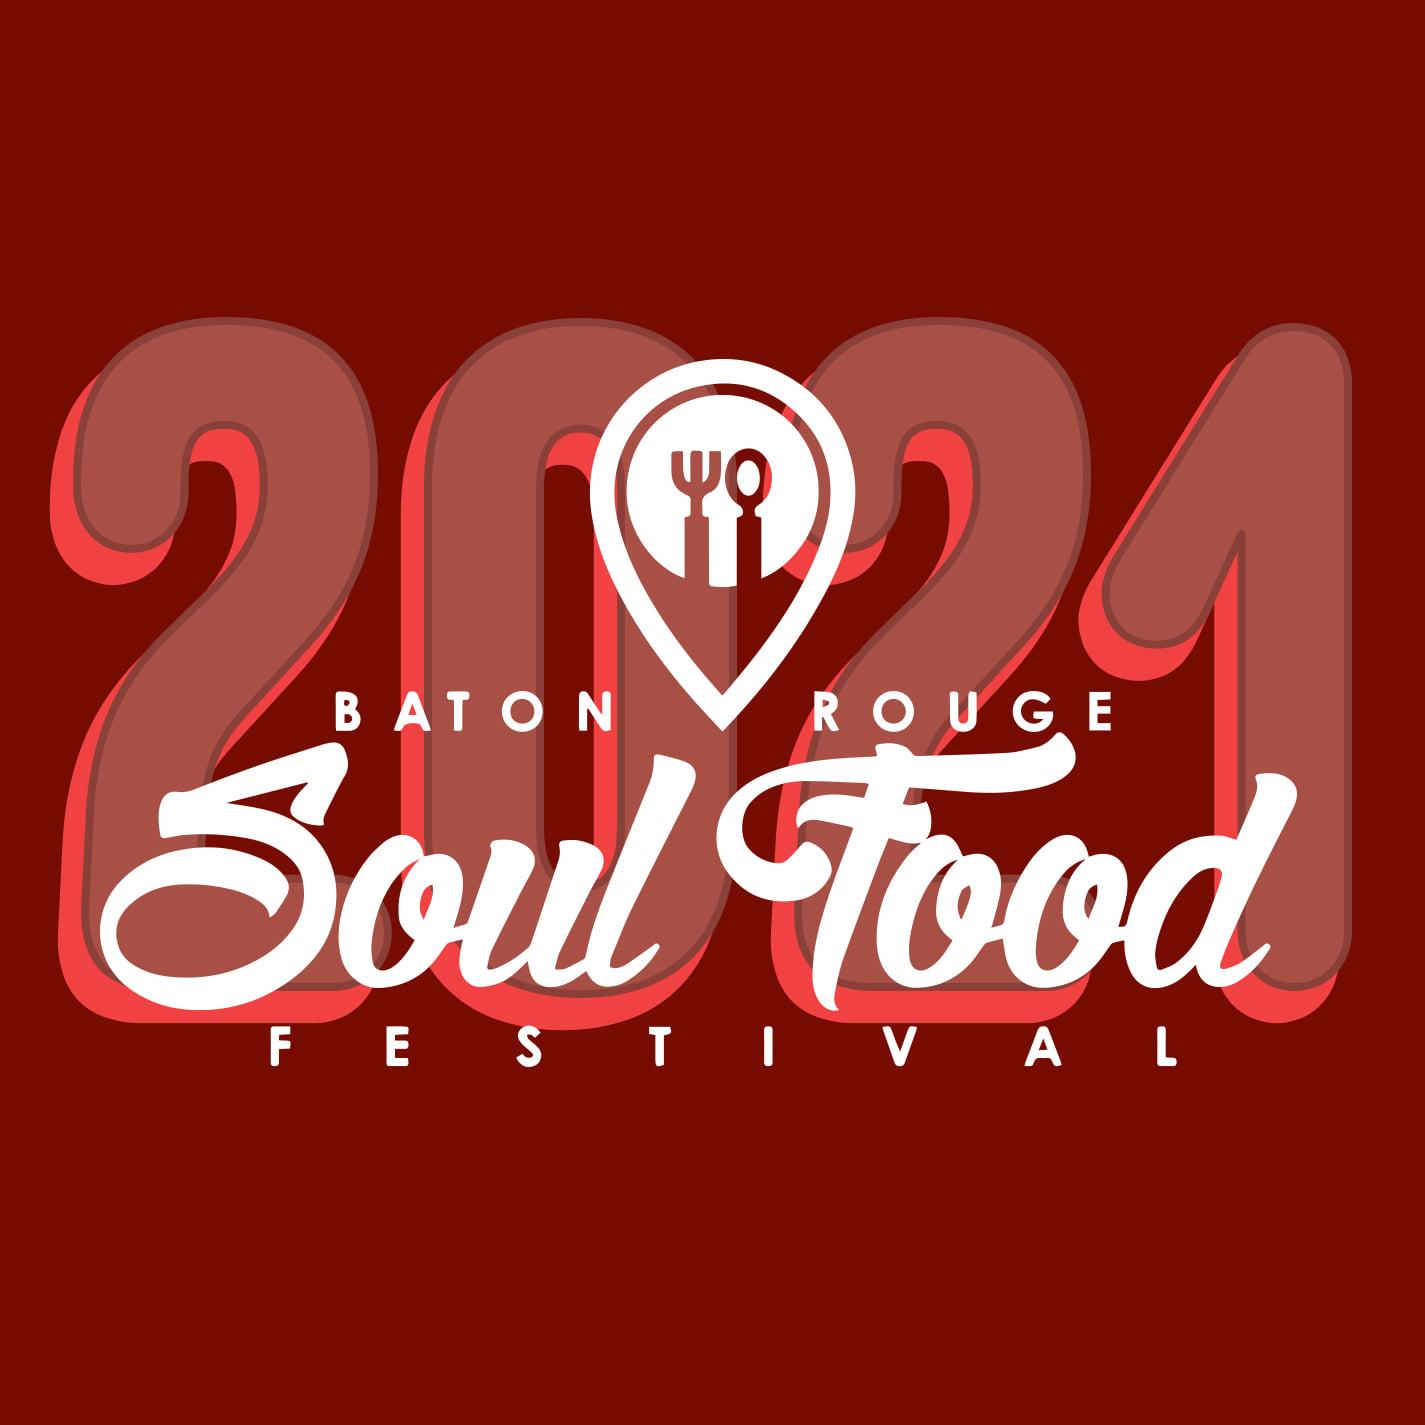 Baton Rouge Soul Food Festival